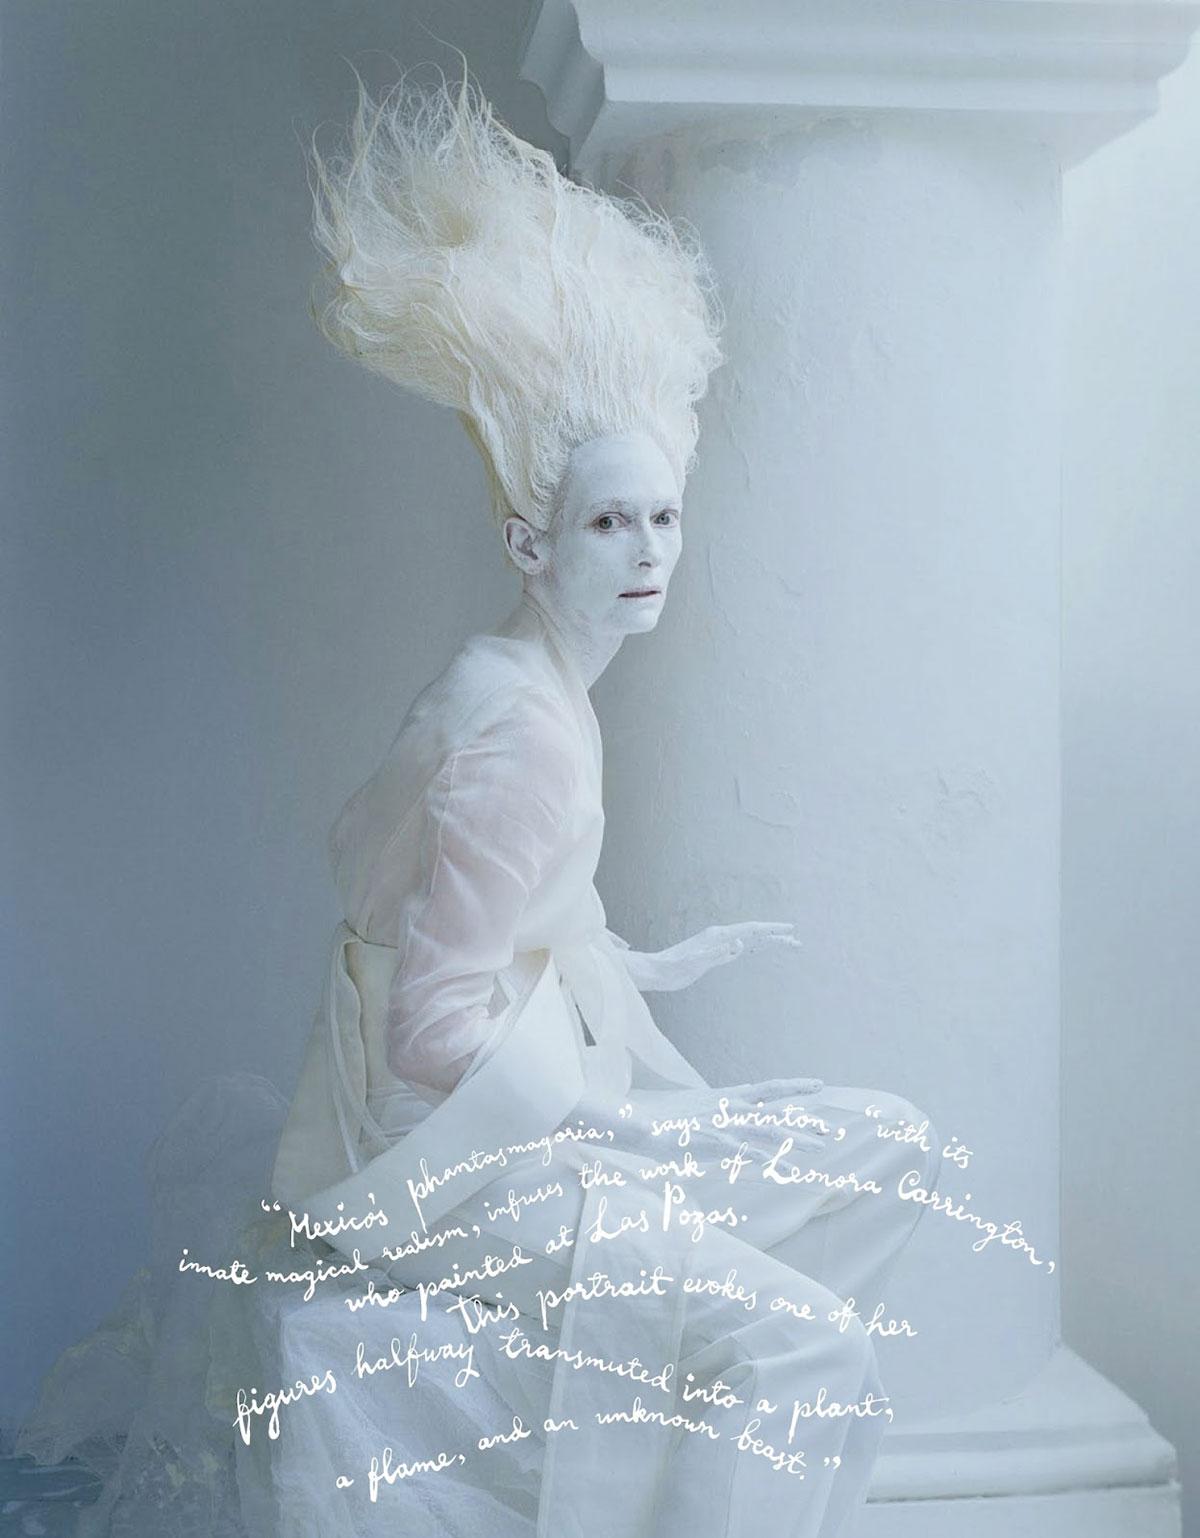 'Stranger Than Paradise' editorial. Tilda Swinton and Tim Walker for W Magazine | Yellowtrace.